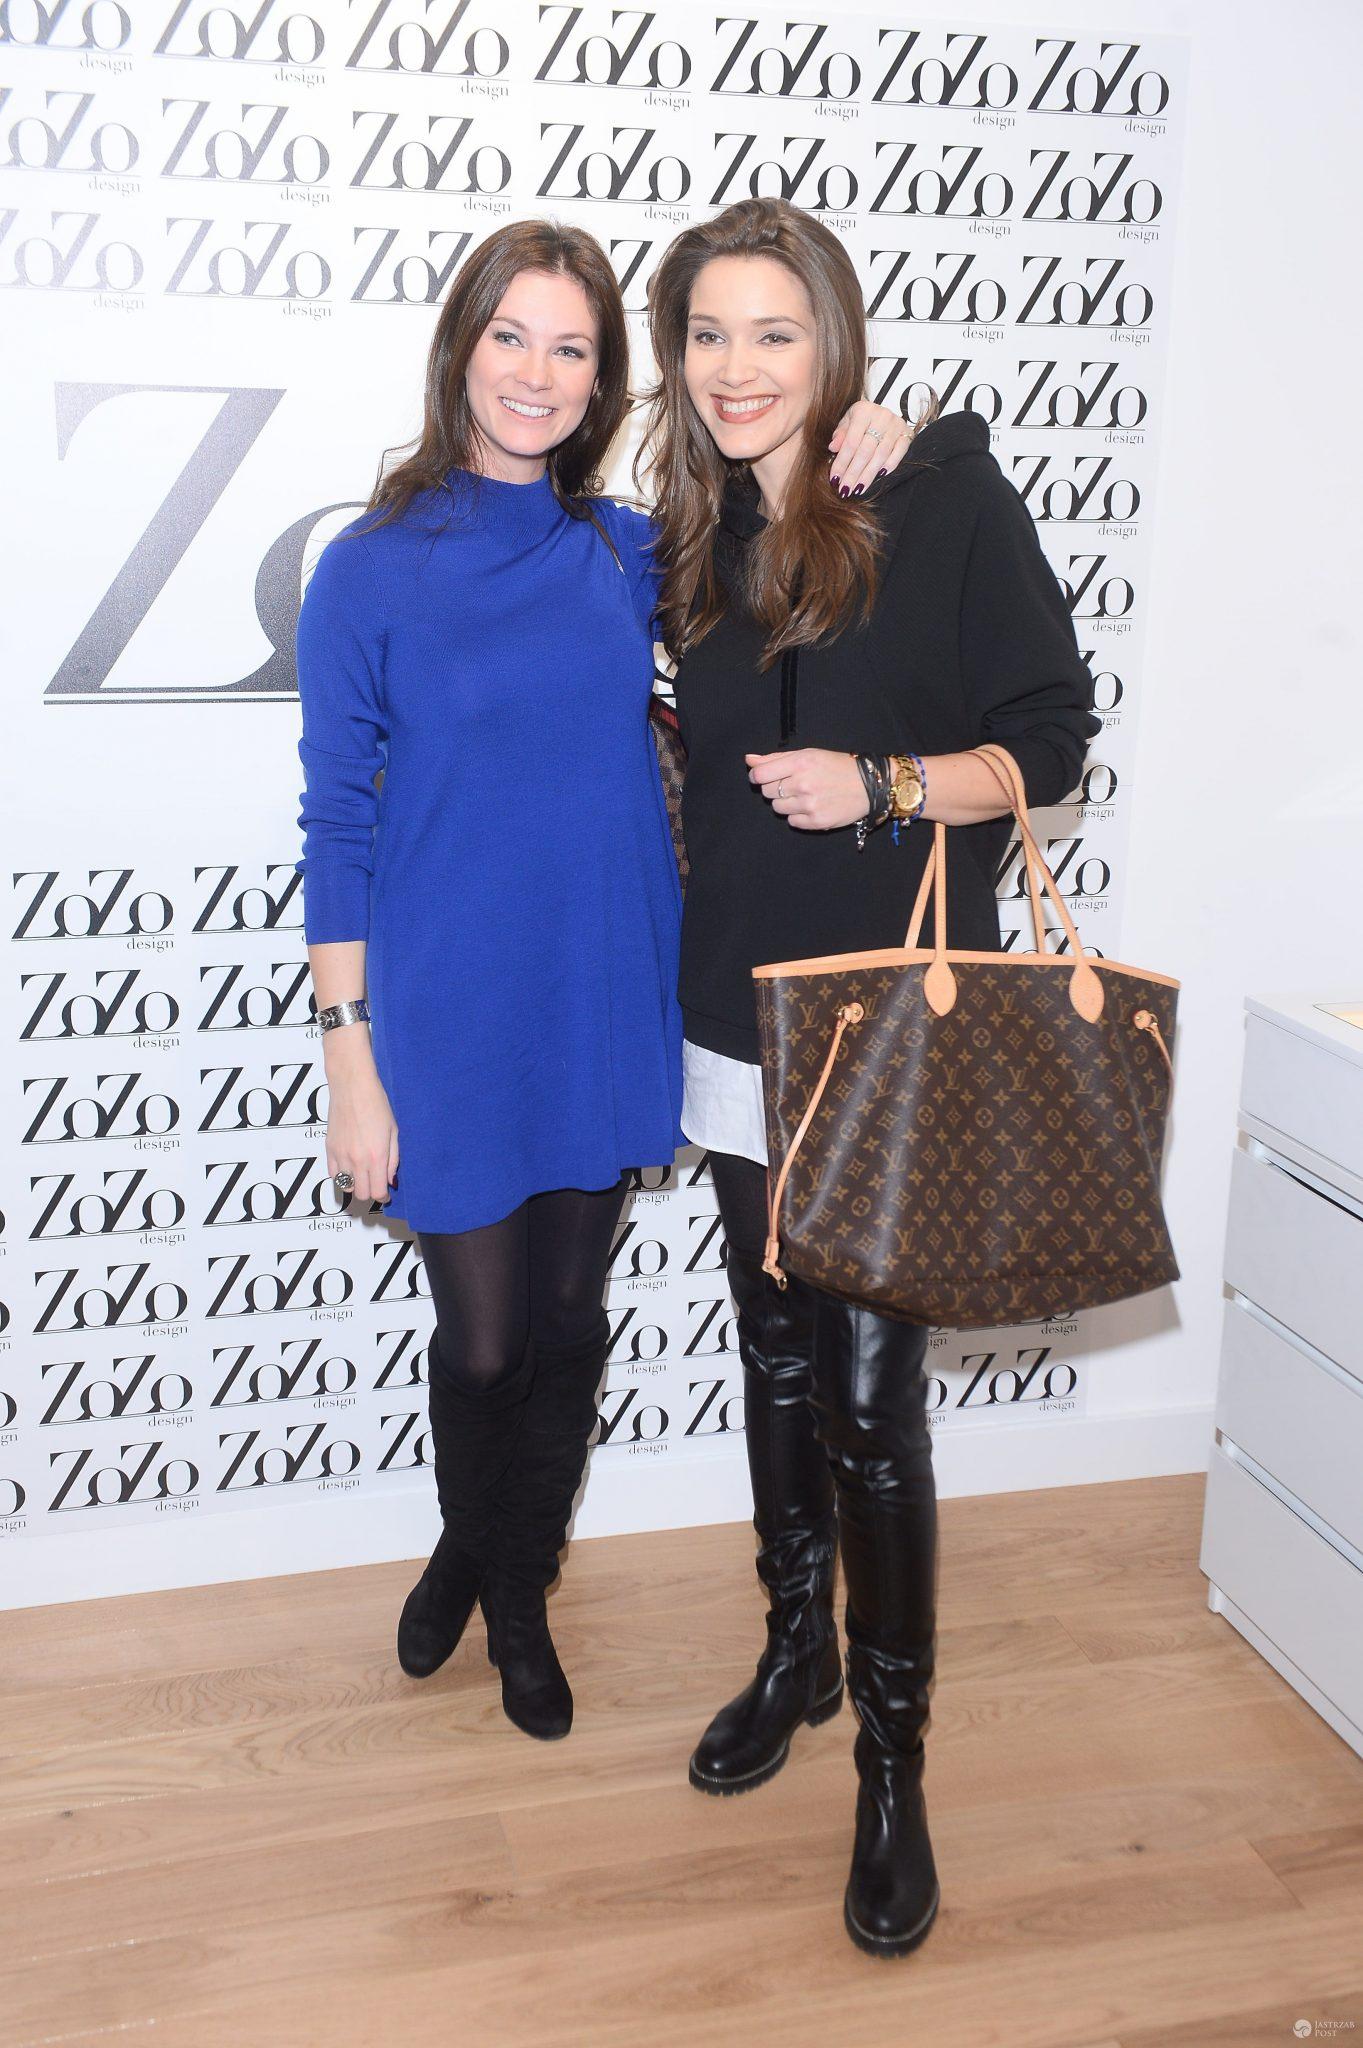 Anna Lucińska, Natalia Jakuła - prezentacja kolekcji ZoZo Design